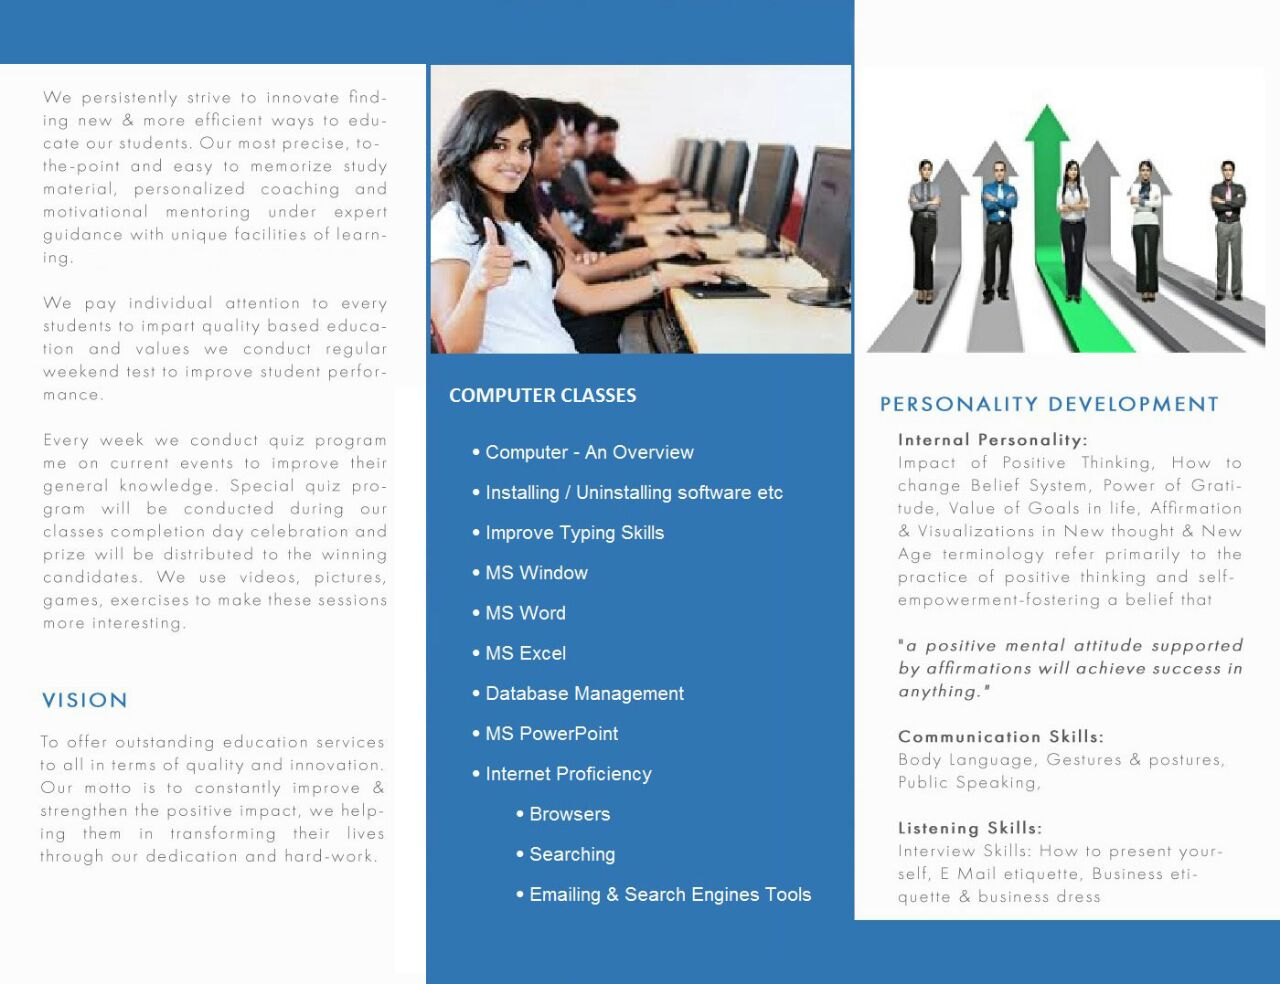 Stock Market Training in Faridabad, Courses, Share Trading Classes